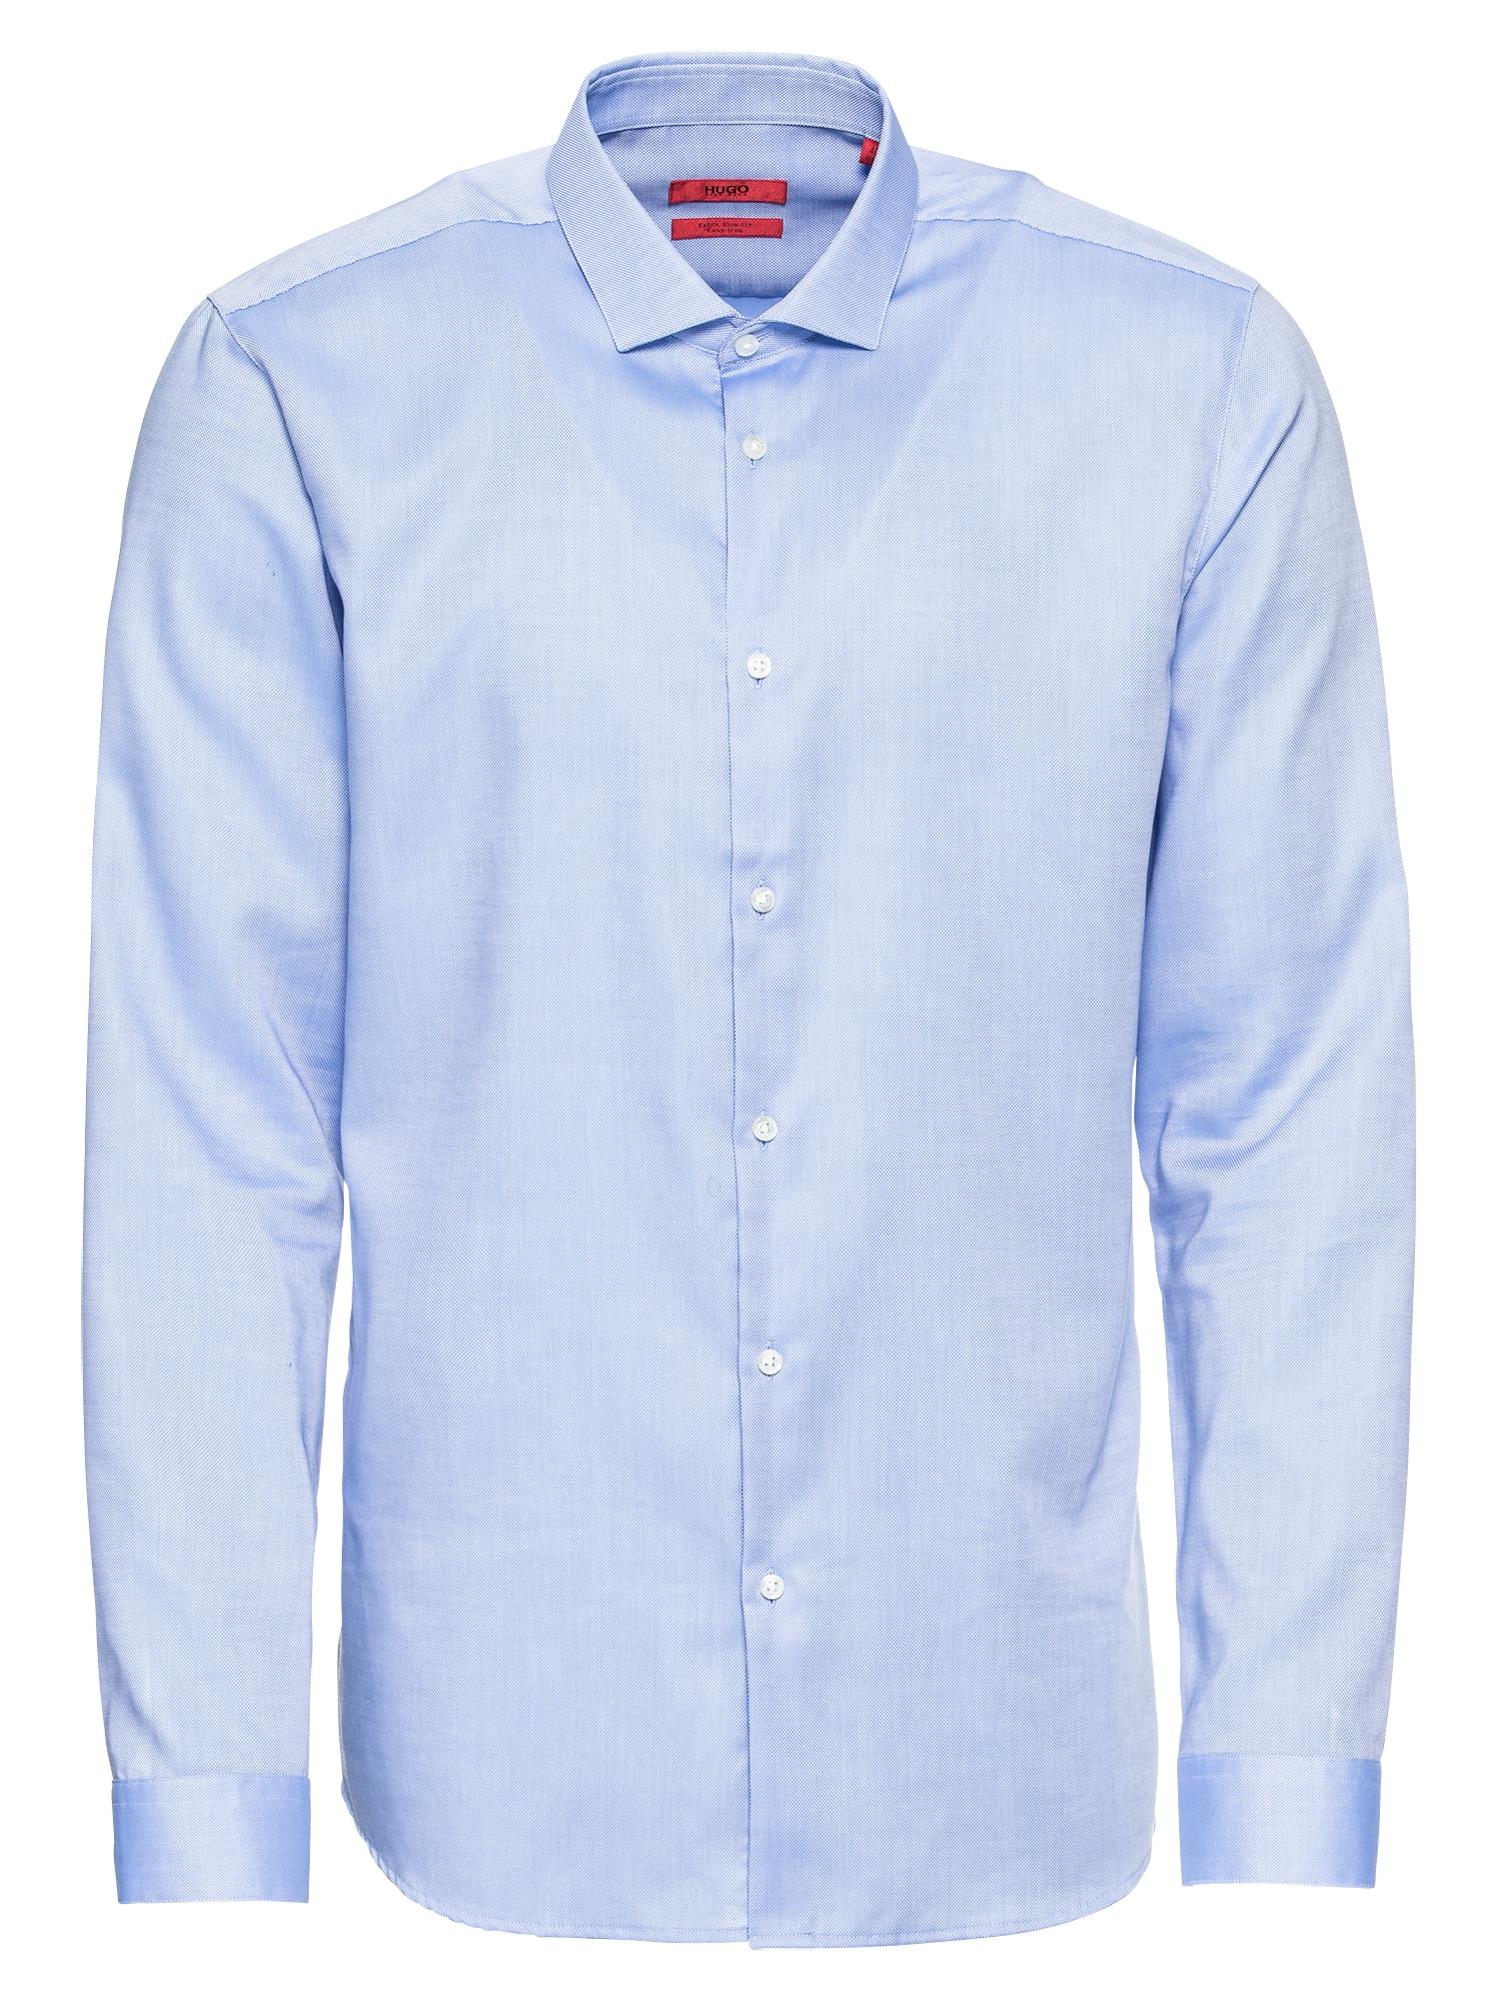 Společenská košile Erondo 10178343 01 modrá bílá HUGO